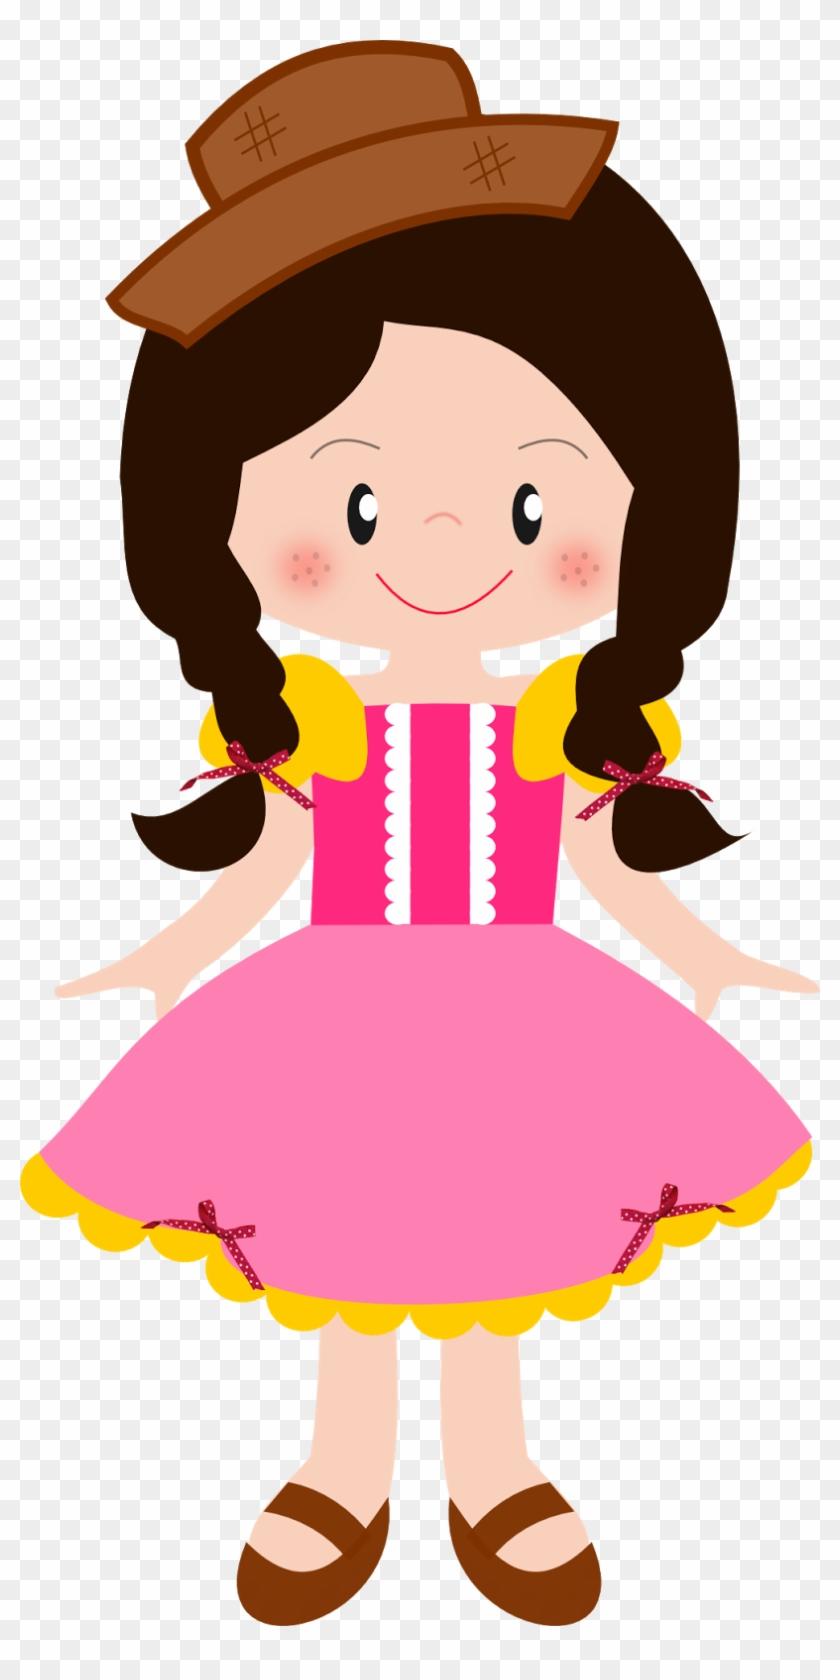 Menina Caipira Cute Montando Minha Festa - Moldes De Caipiras Para Festa Junina #63572